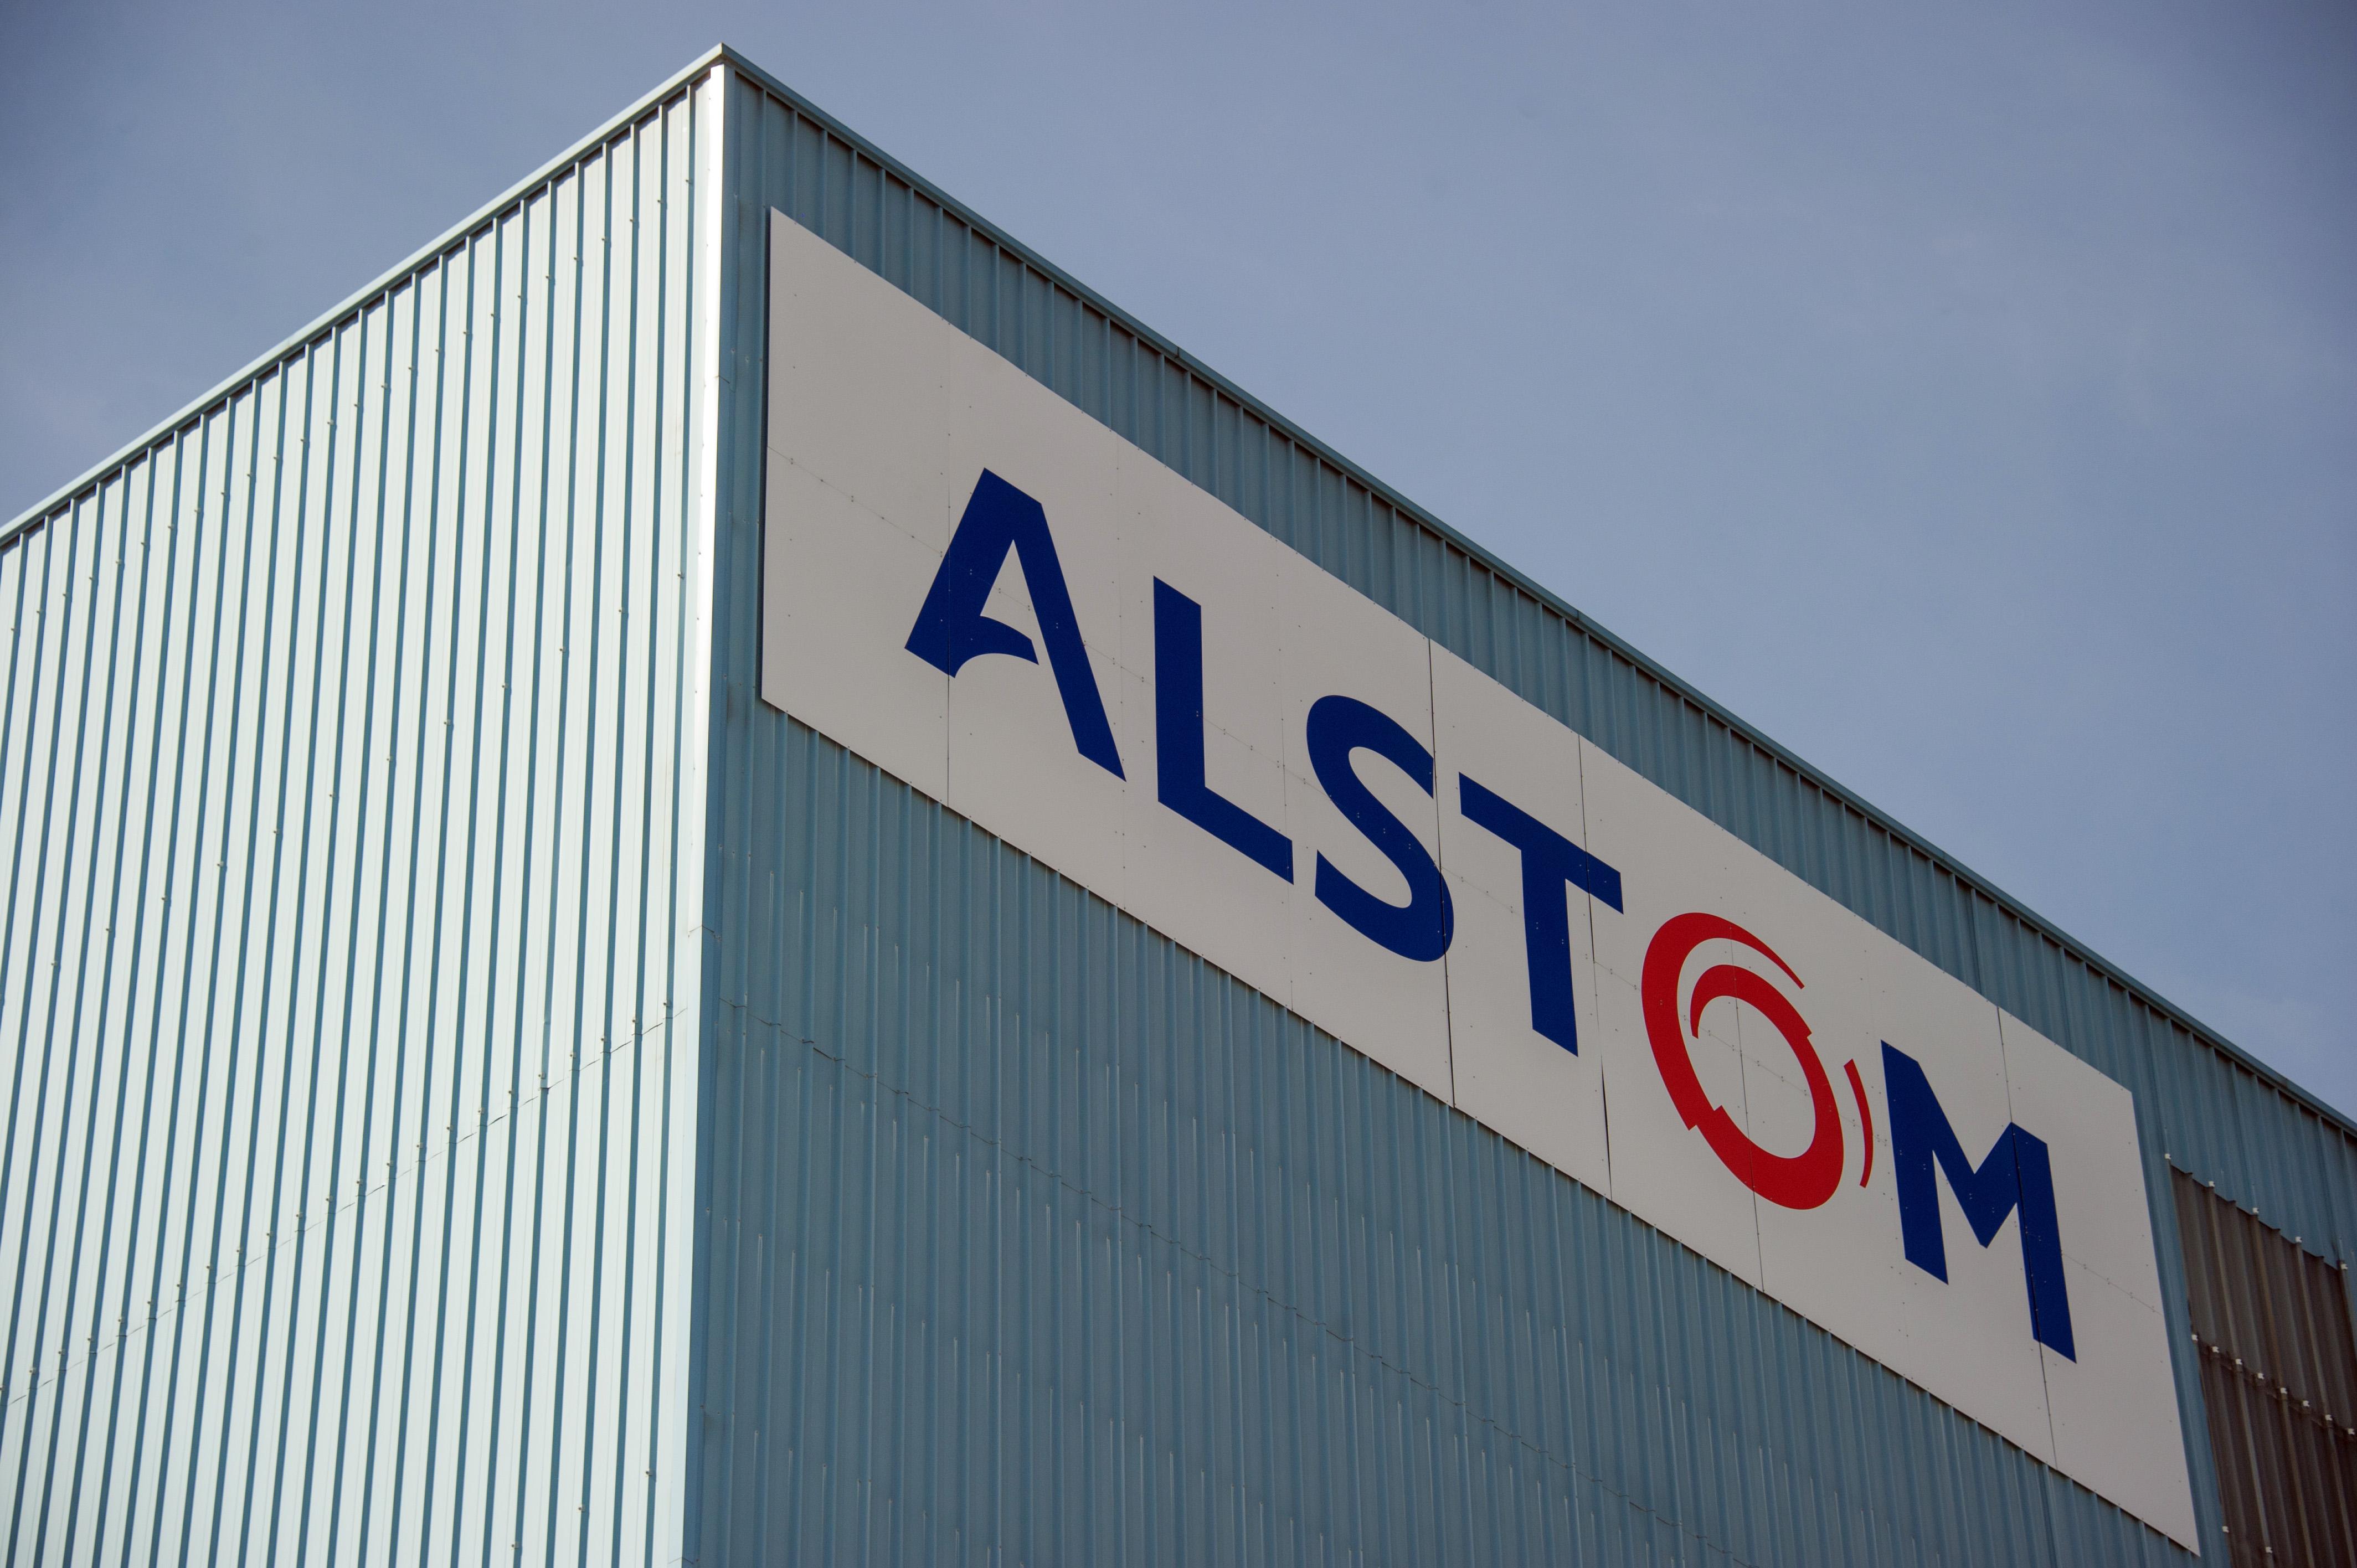 US prosecutors accuse ex-Alstom executives of bribery